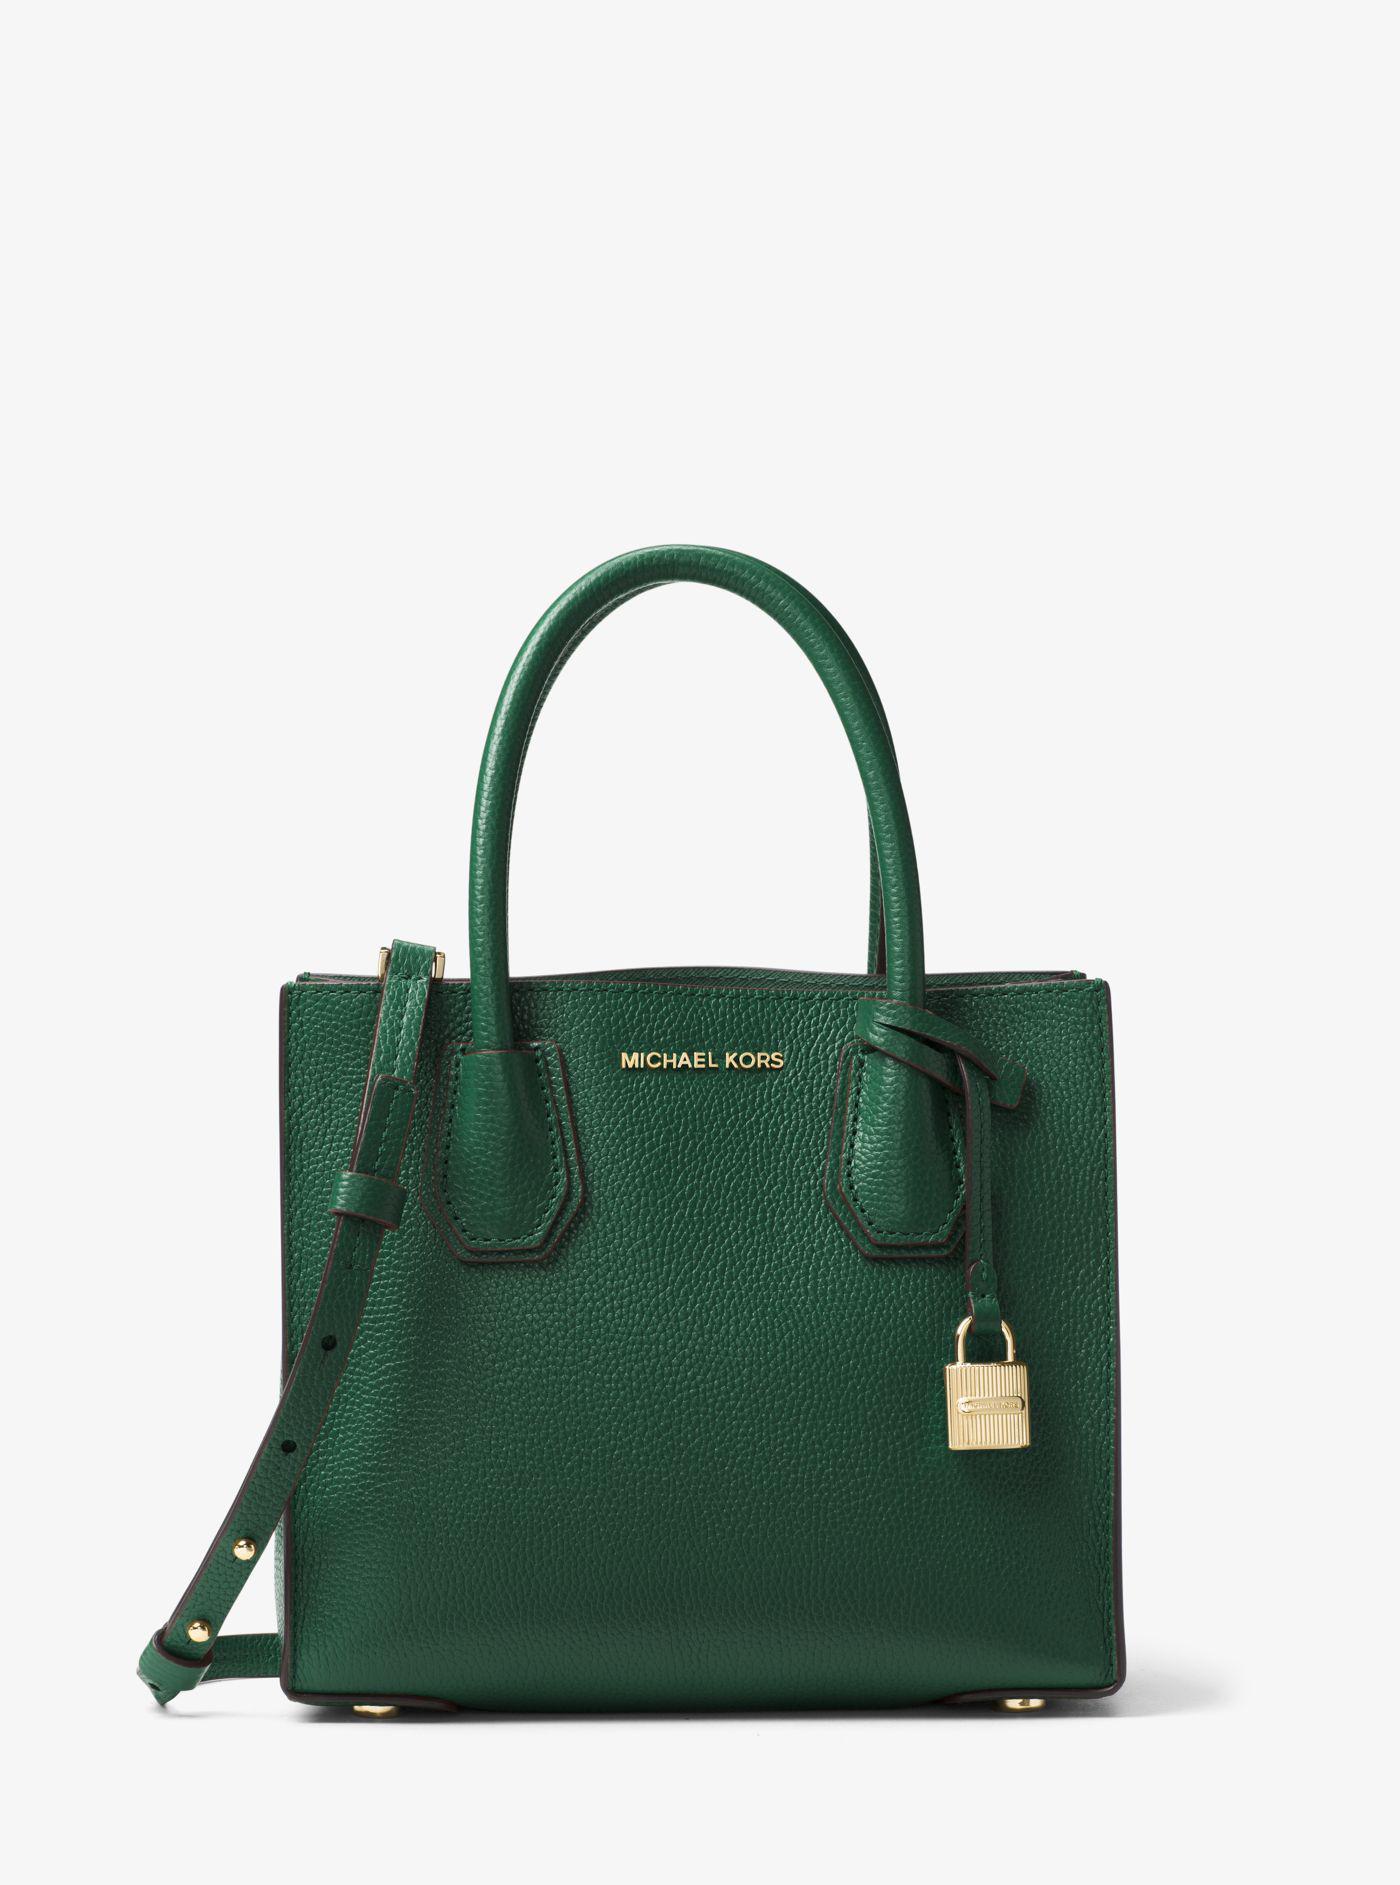 c4a2898d308a 63f2b 53d5f; germany michael kors mercer mini matching wallet lyst michael  kors mercer medium leather bag in green